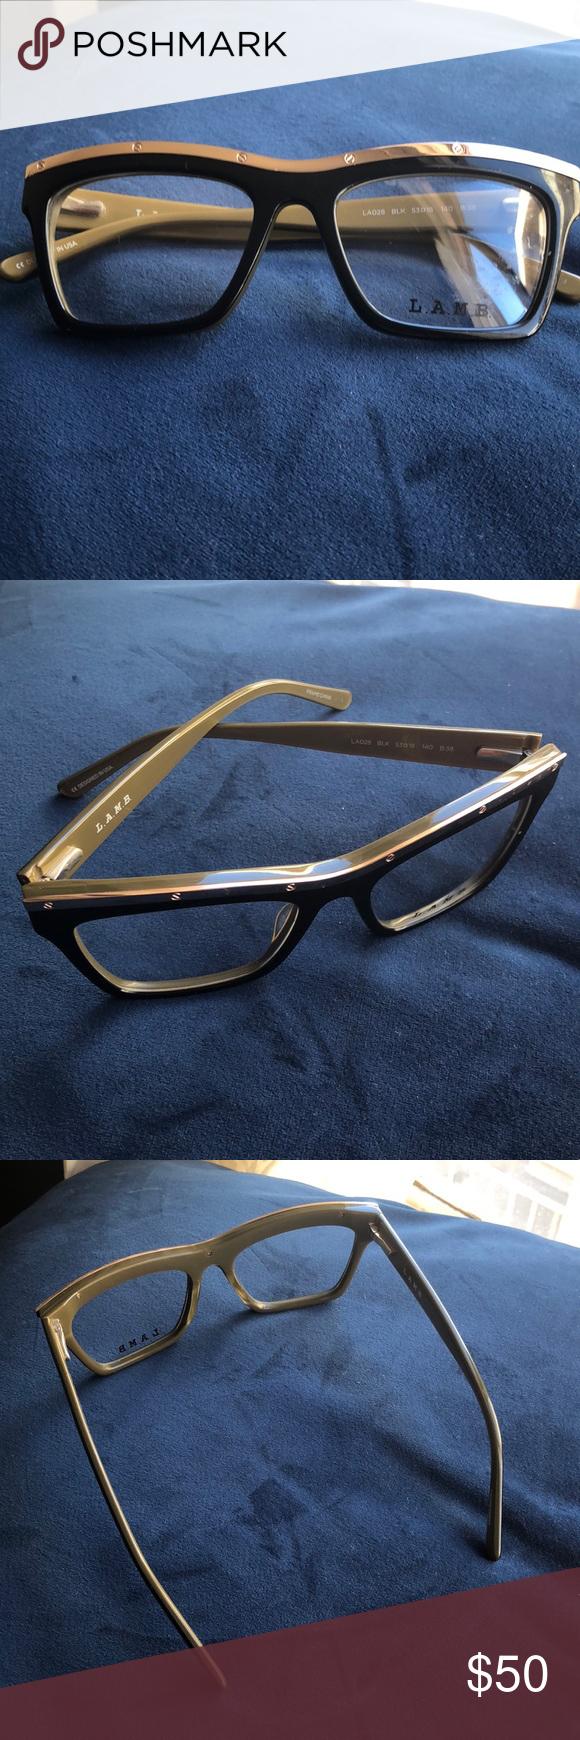 33d95b8f903 L.A.M.B. BY GWEN STEFANI LA028 OPTICAL GLASSES! Black LAMB eyewear.  Metallic gold lining.